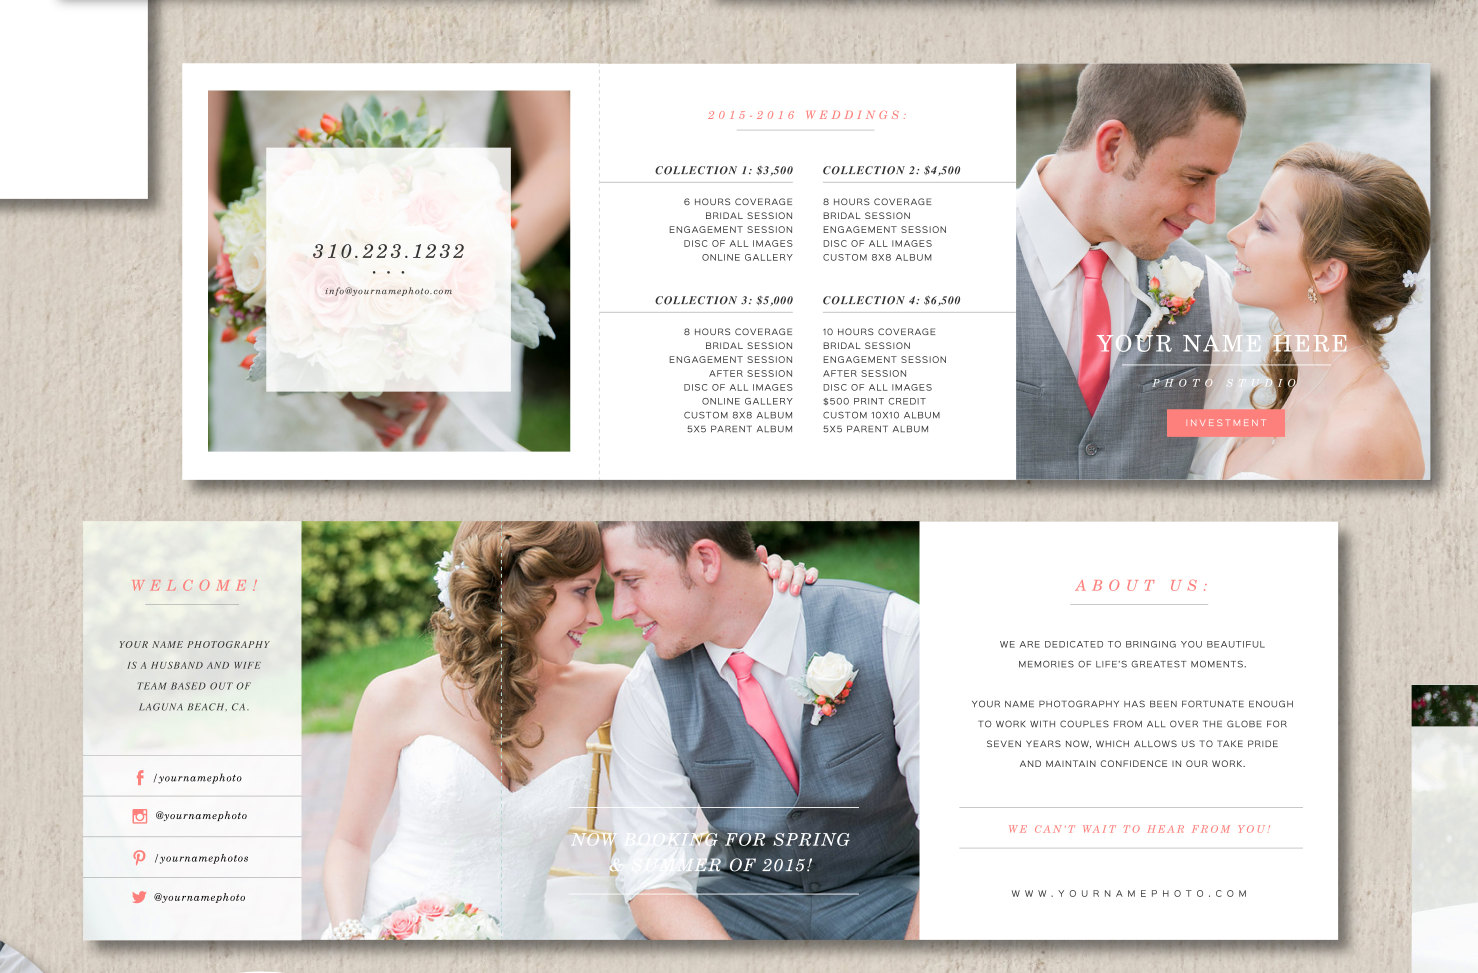 wedding-photo-marketing.jpg